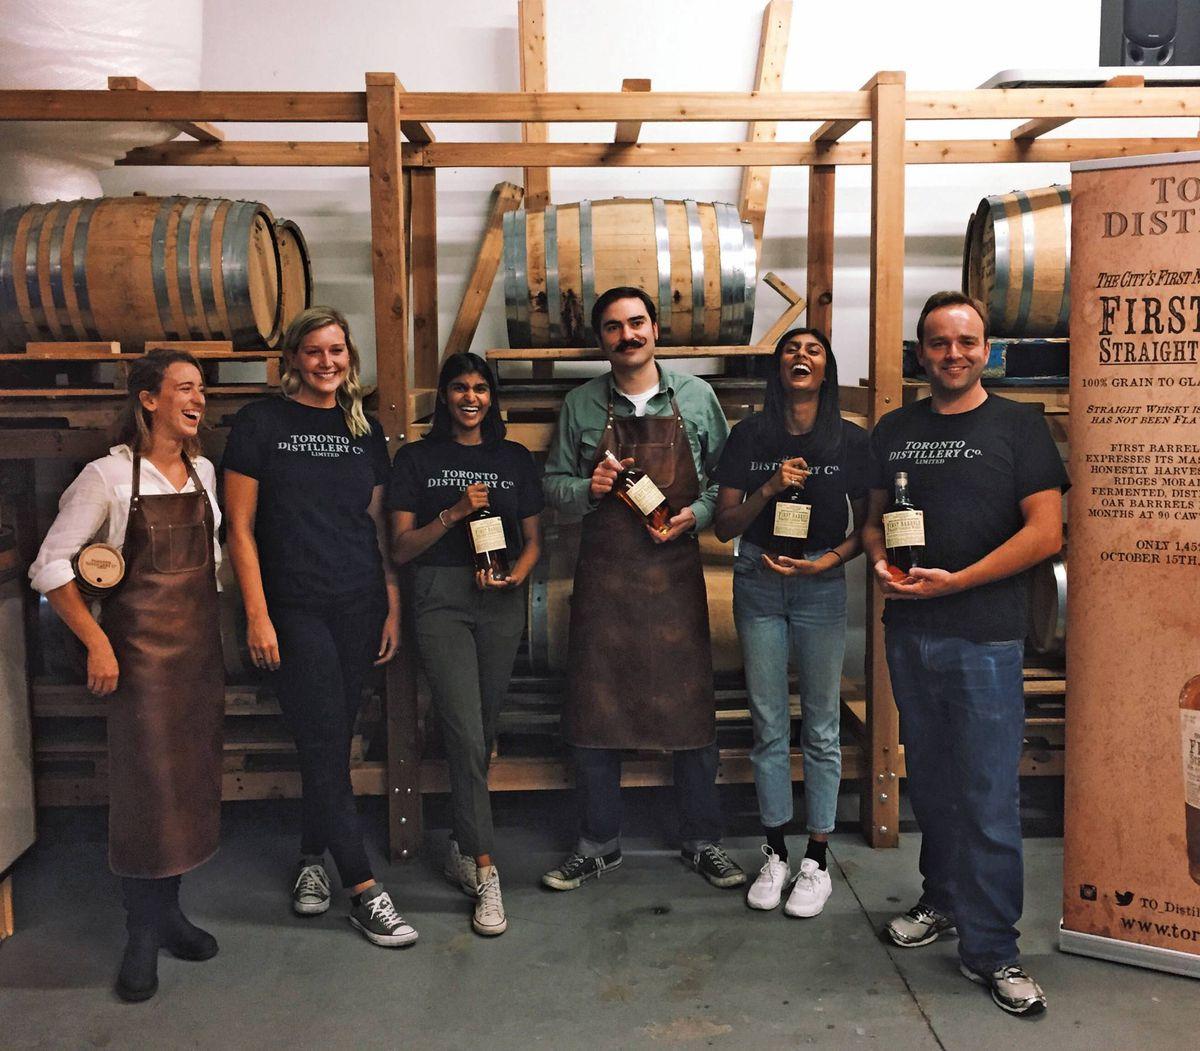 Toronto Distillery Co.